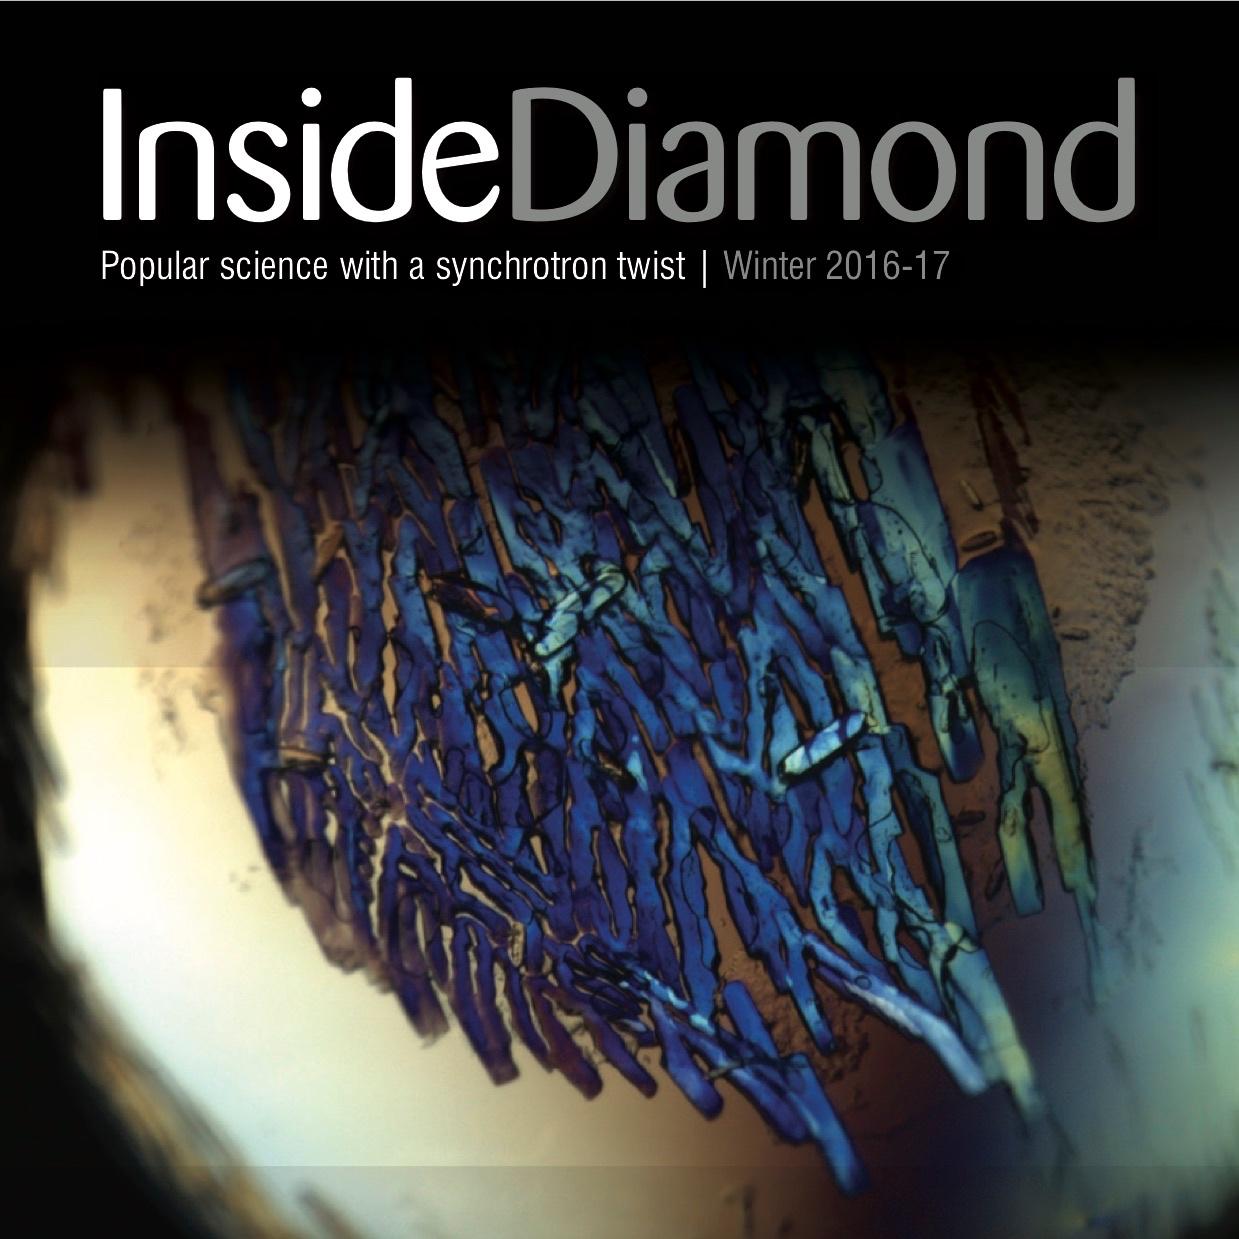 InsideDiamondWinter2016-17.jpg